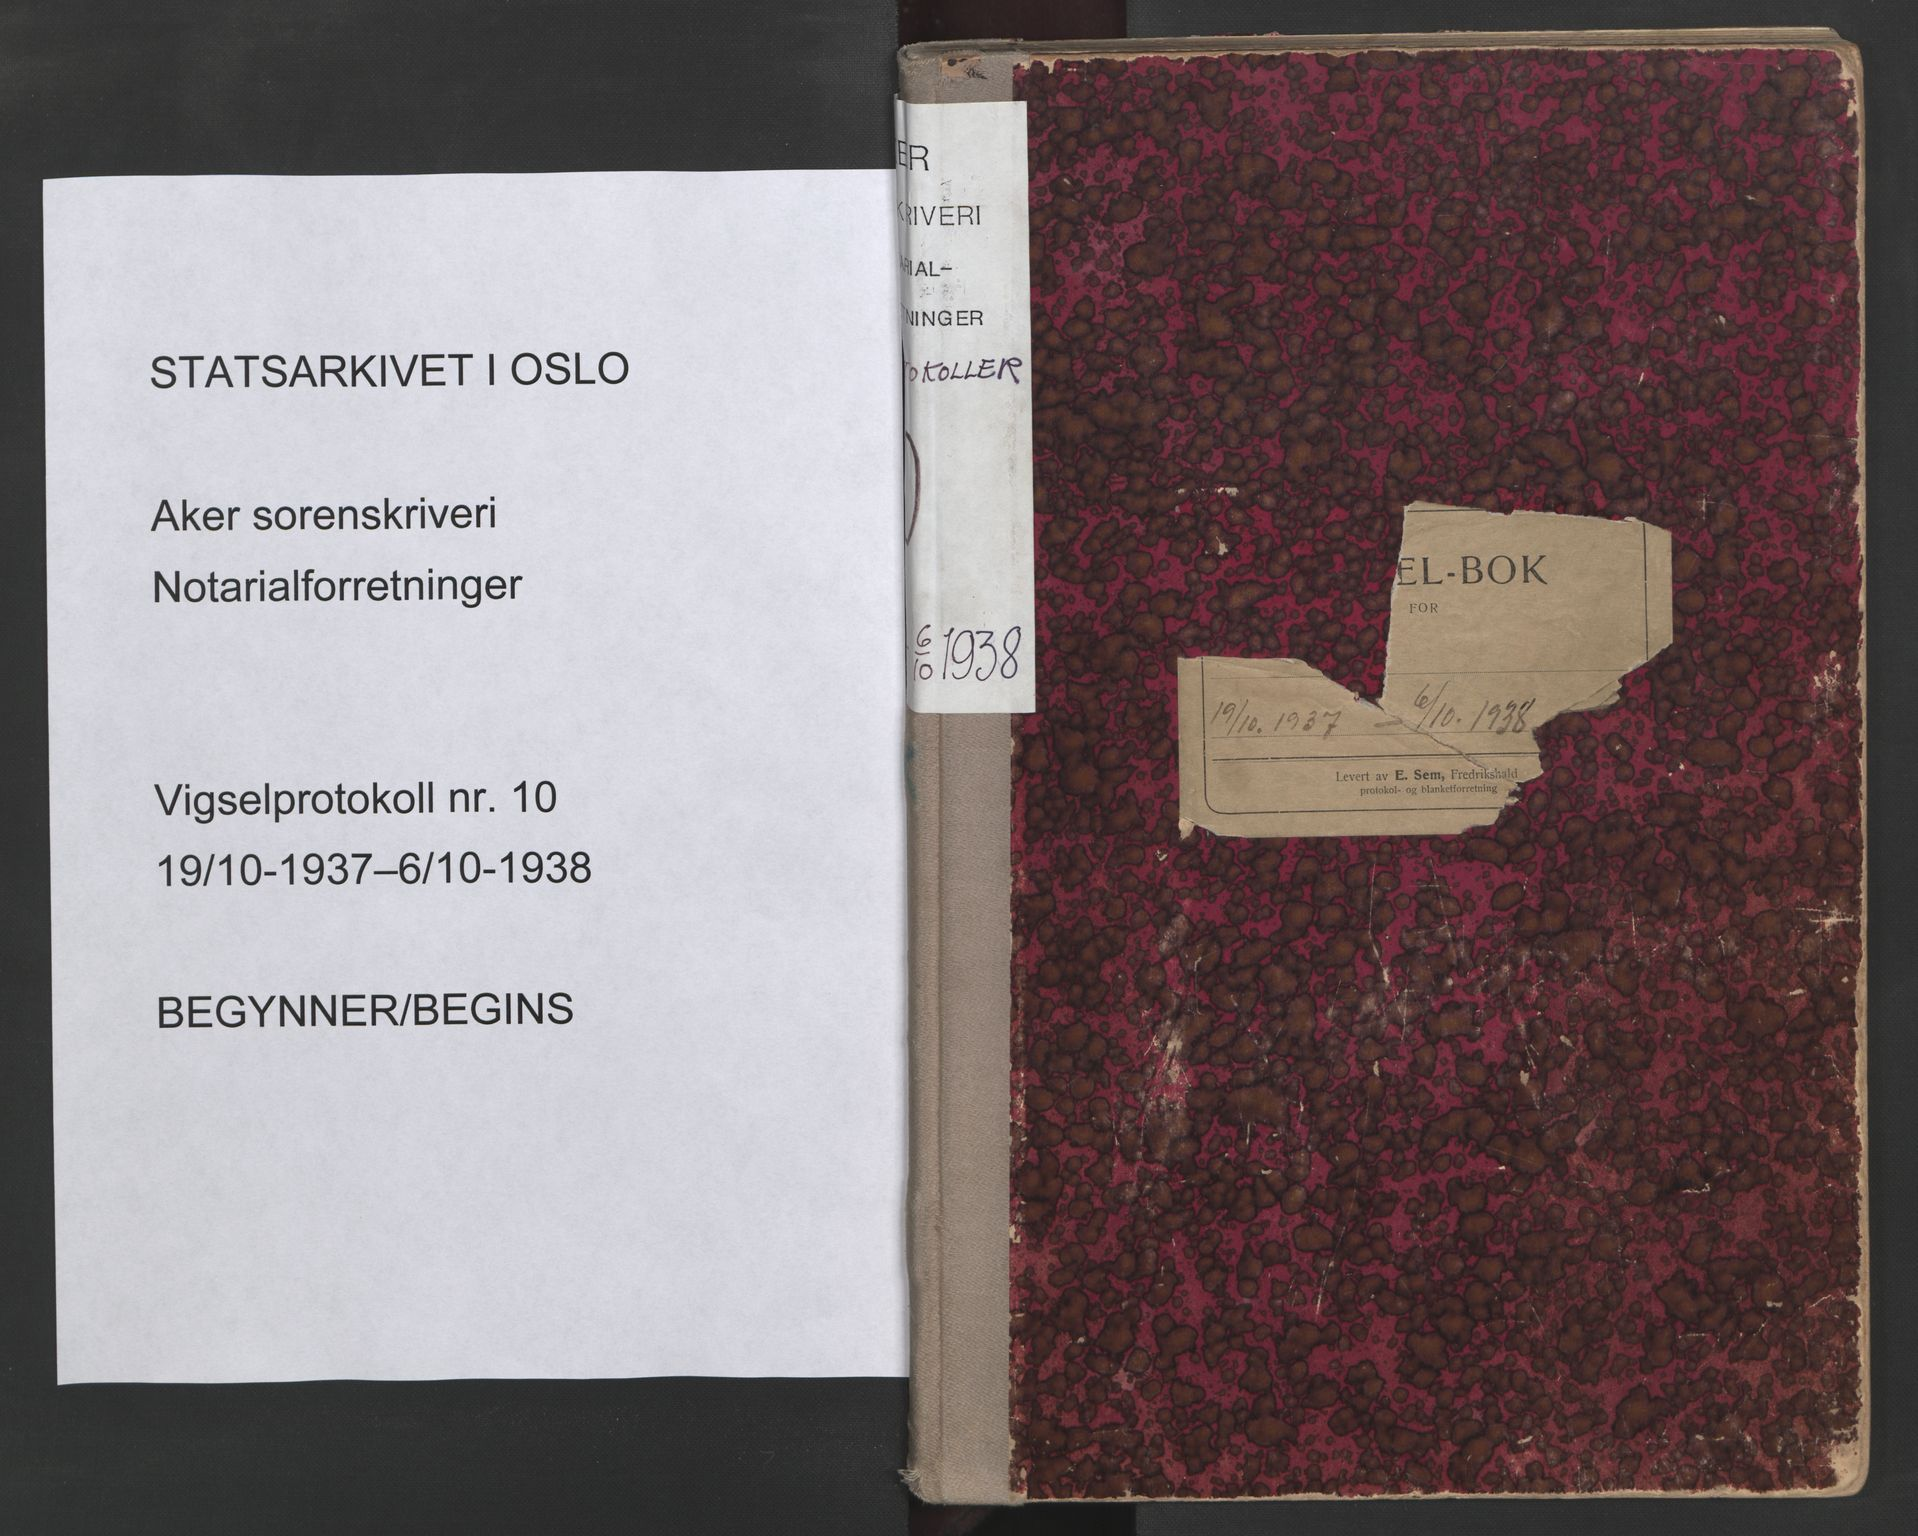 SAO, Aker sorenskriveri, L/Lc/Lcb/L0010: Vigselprotokoll, 1937-1938, s. upaginert